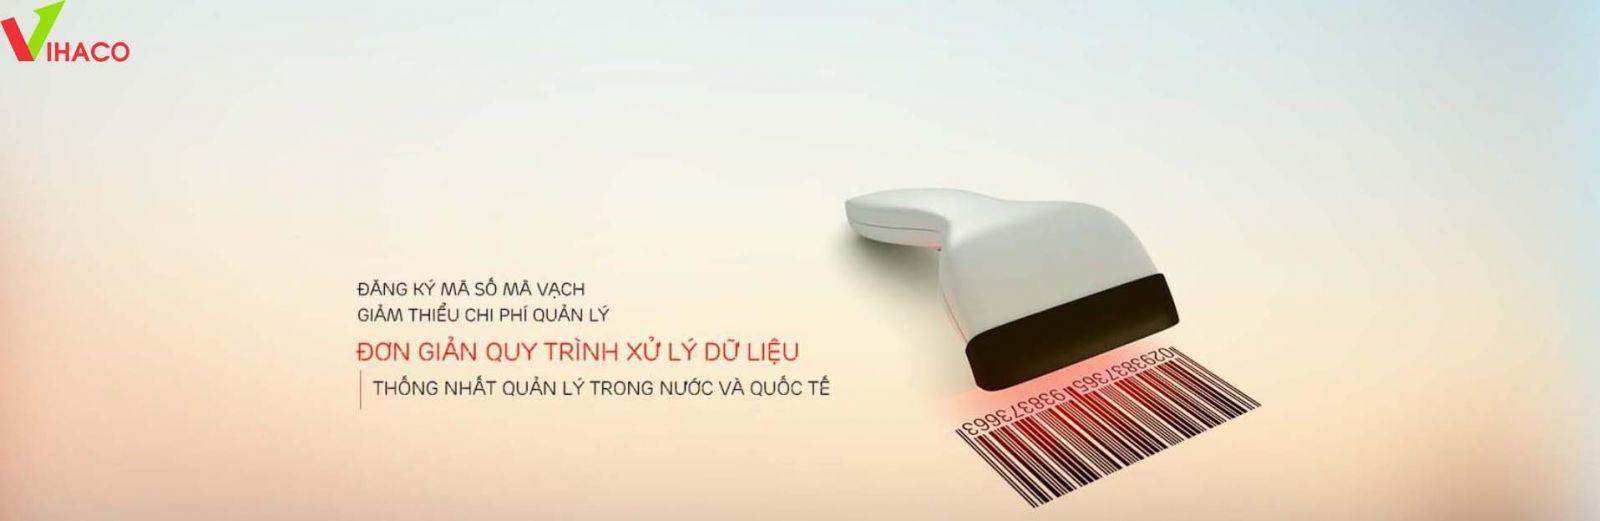 dang-ky-ma-so-ma-vach-cho-san-pham-trong-va-ngoai-nuoc